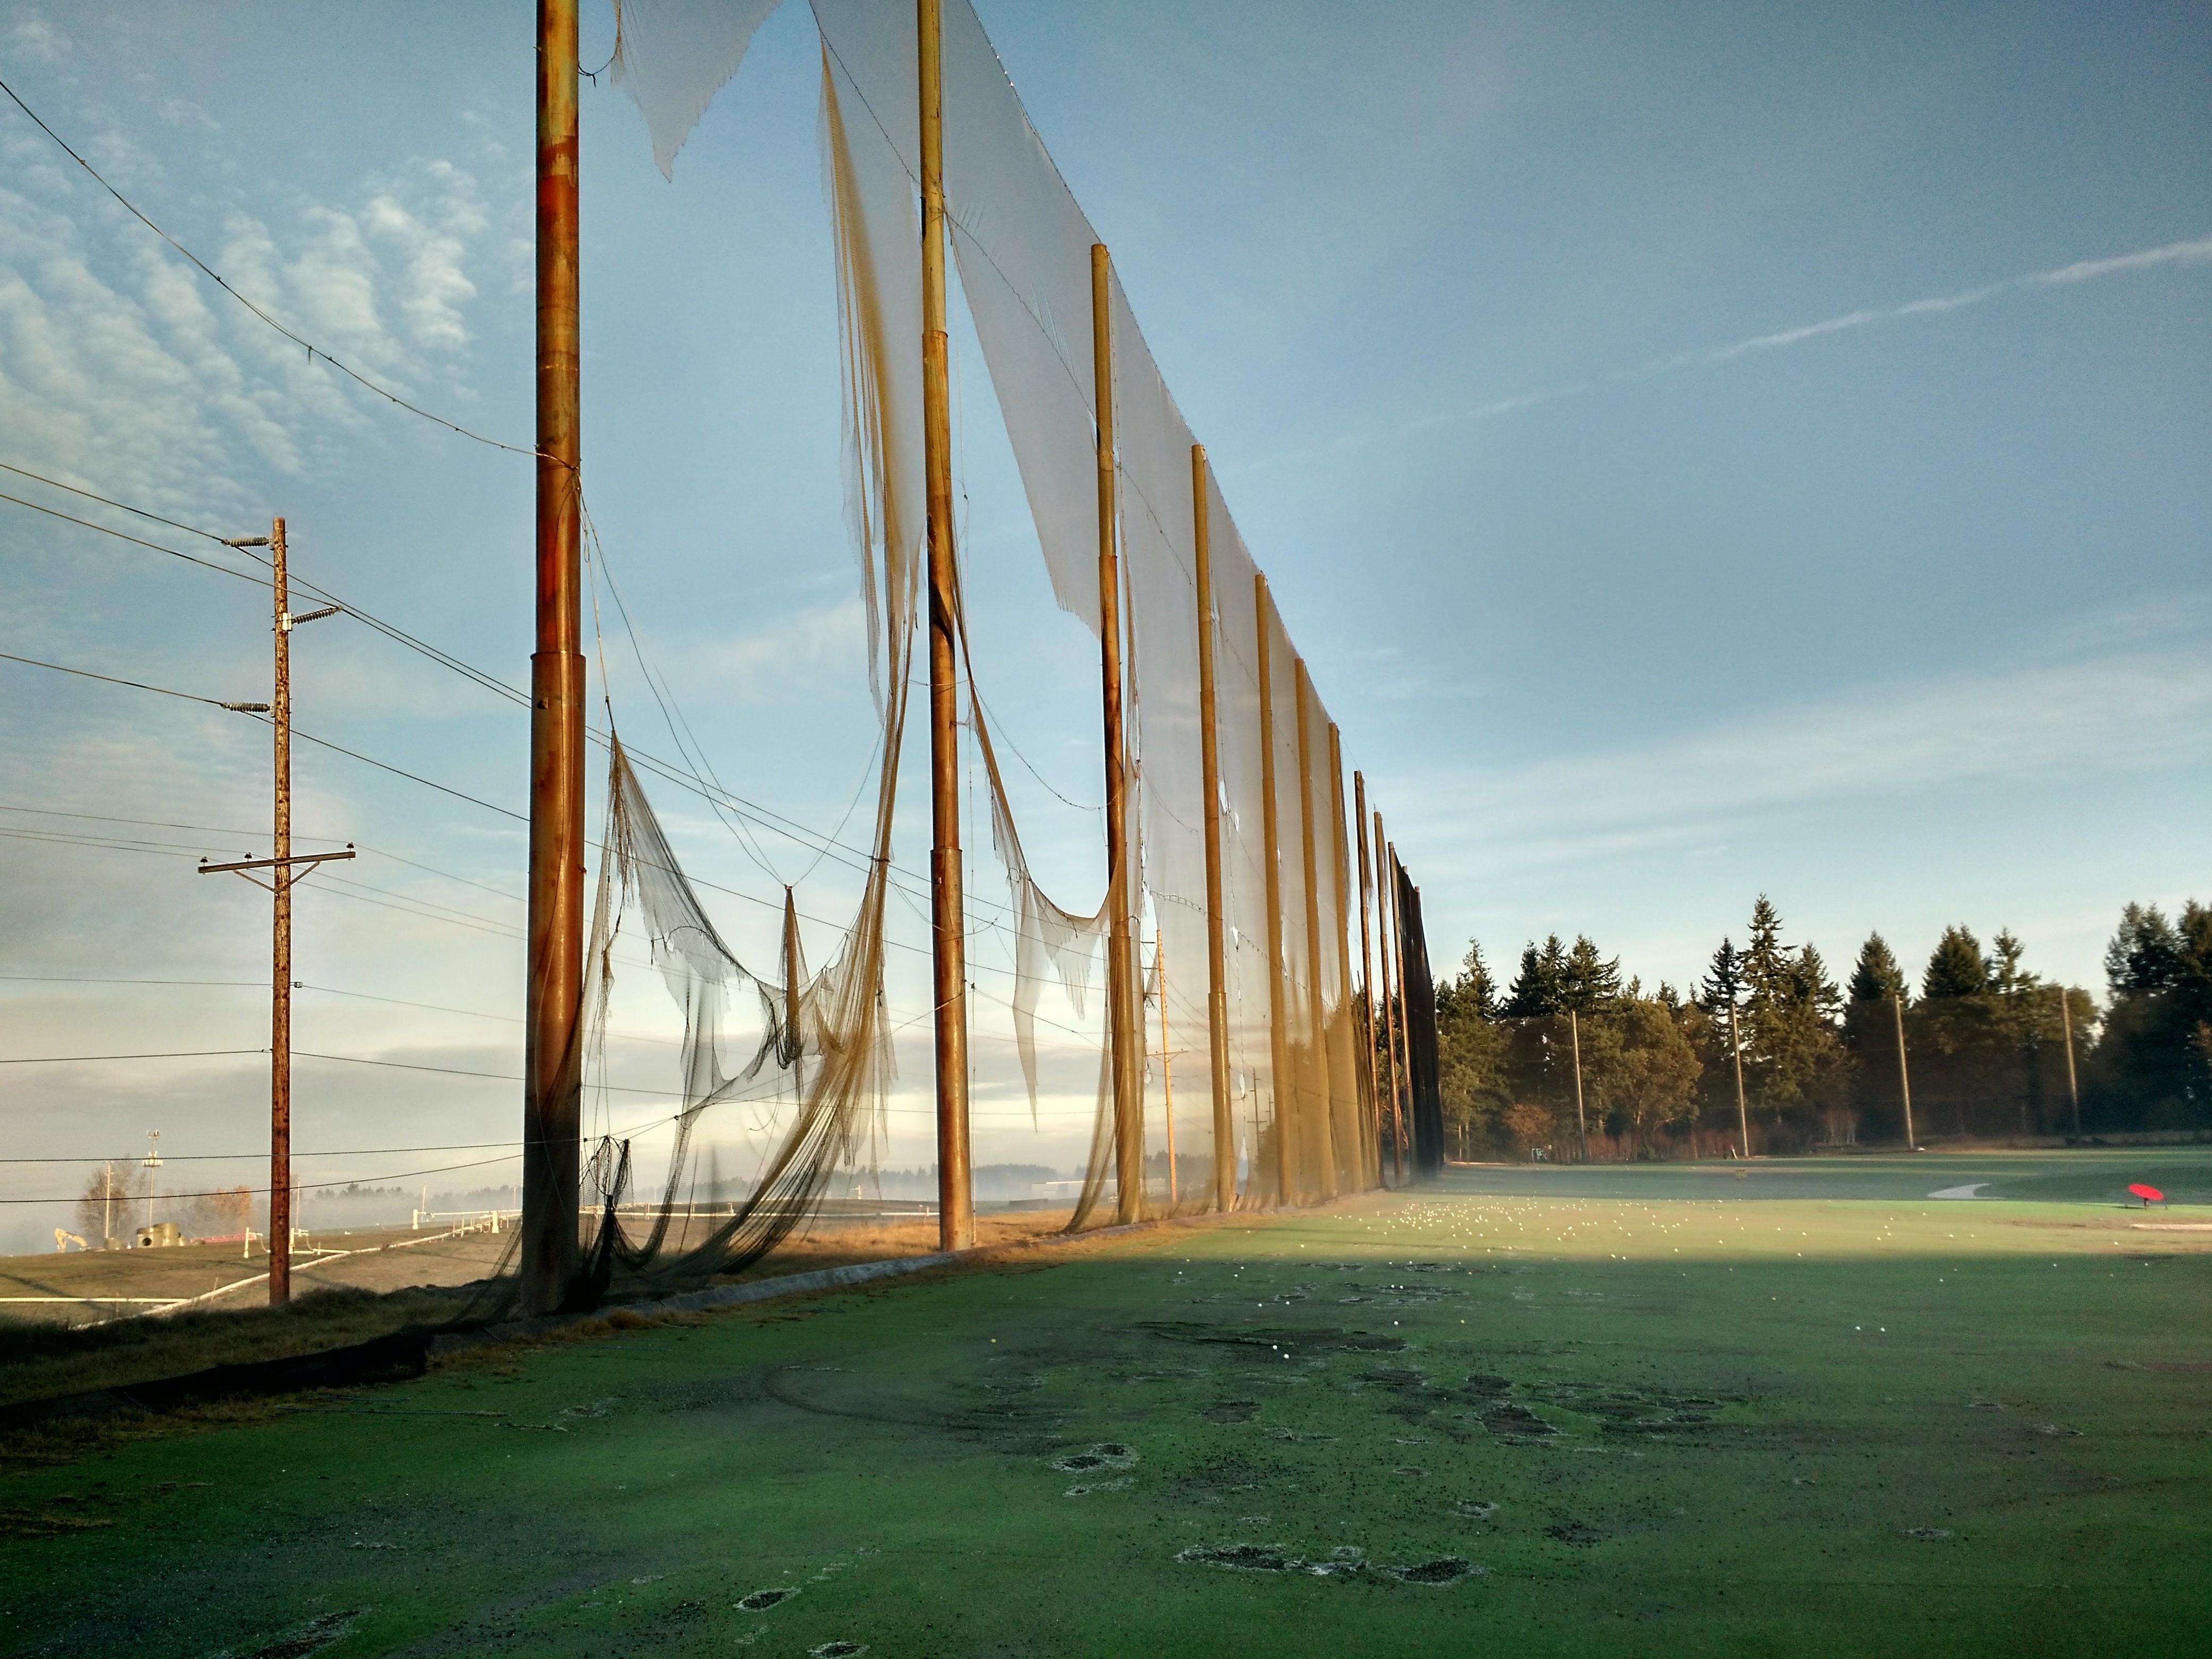 Weather Damaged Golf Netting